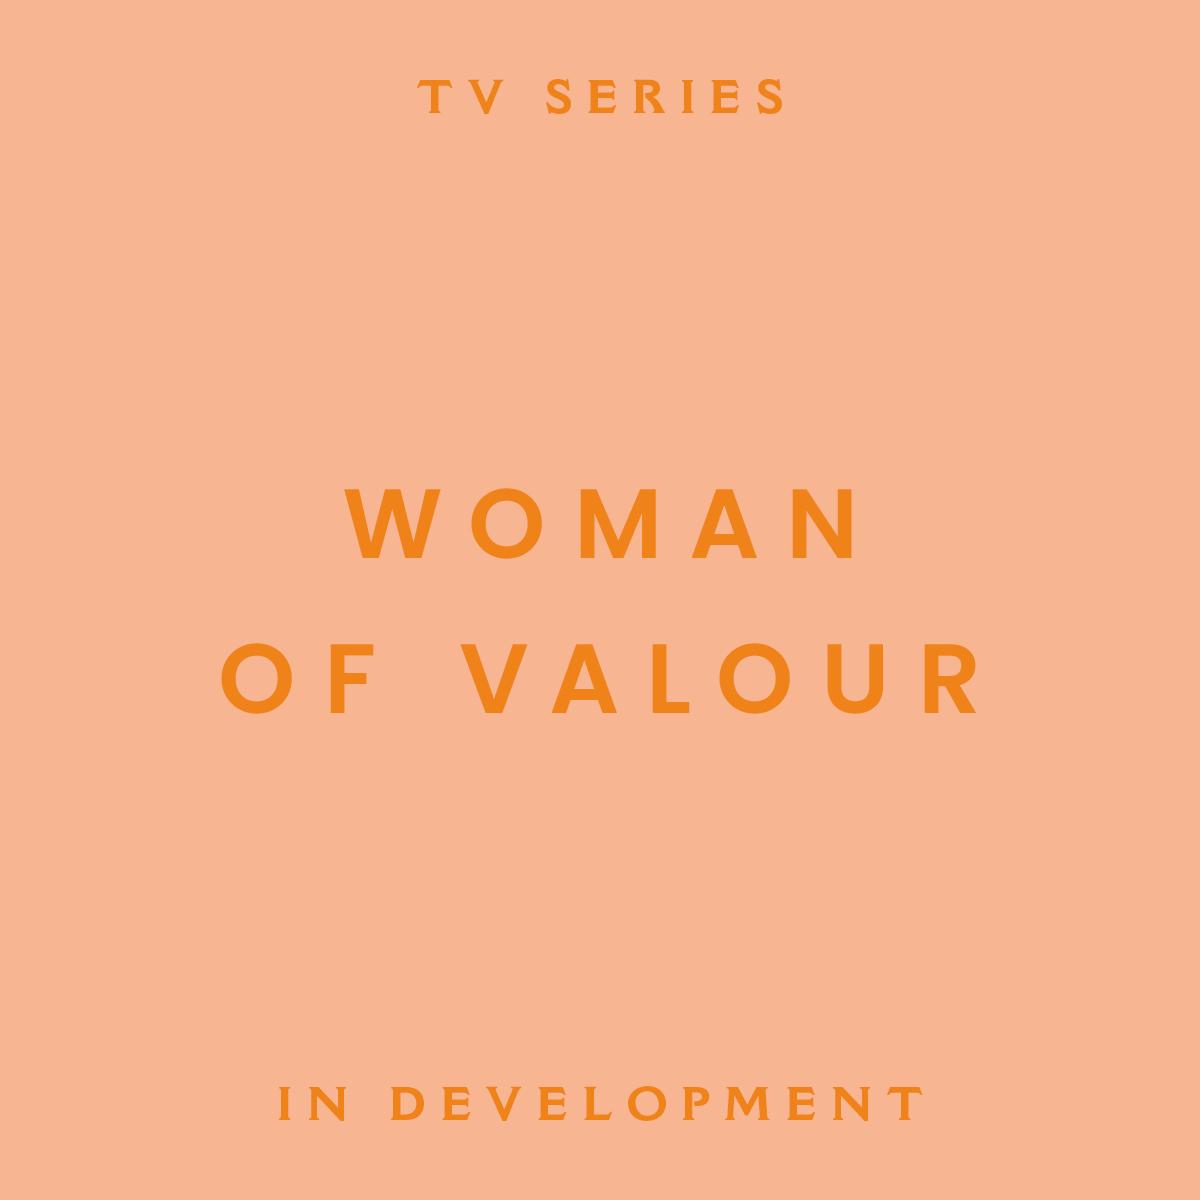 woman of valour, tv series, in development